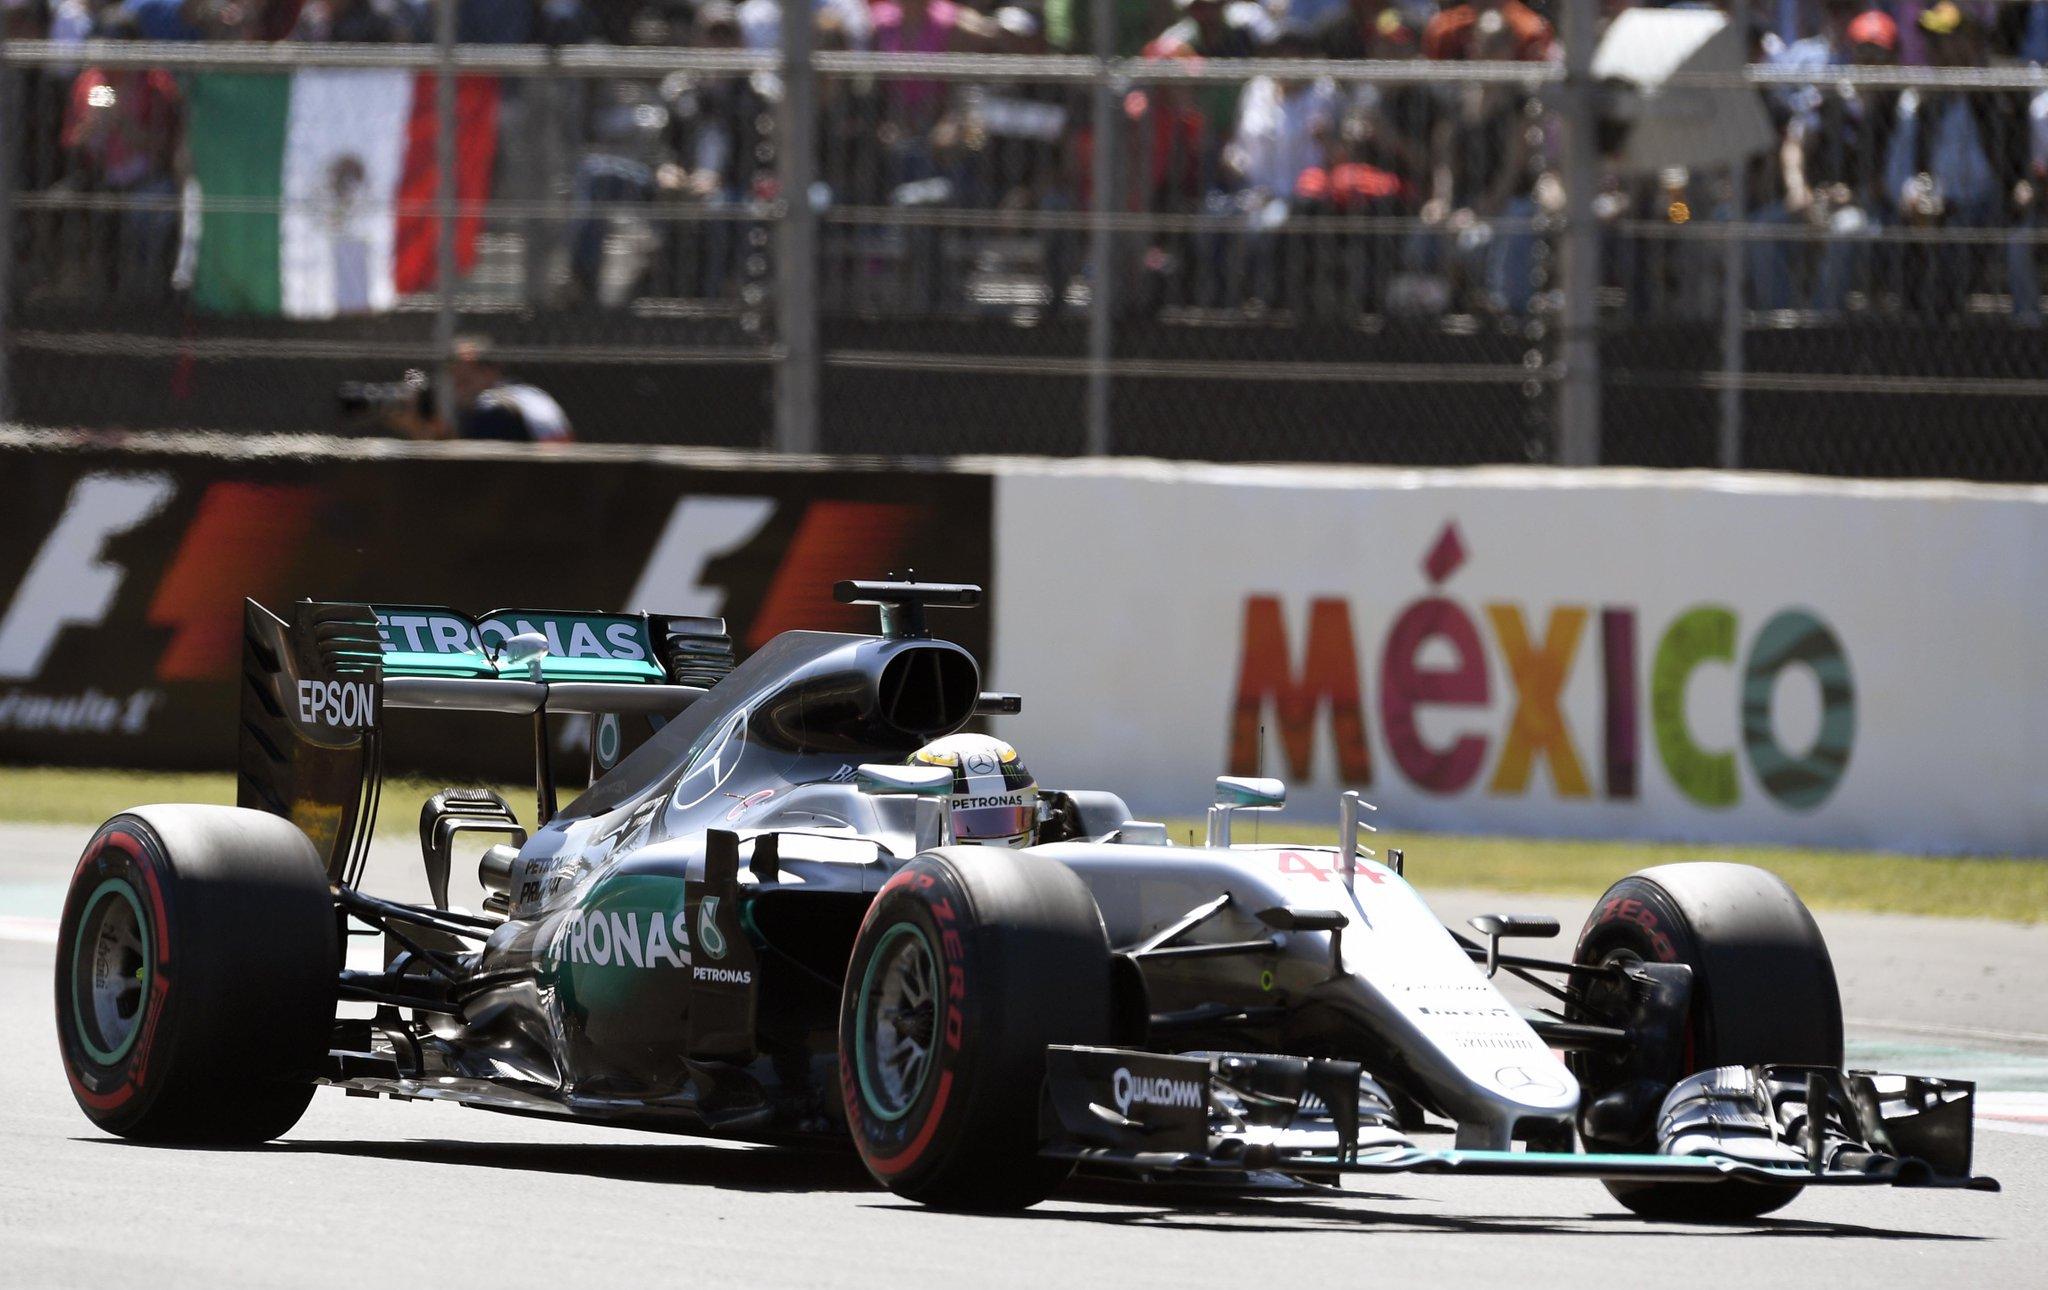 Квалификацию Гран-При Мексики одержал победу Льюис Хэмилтон